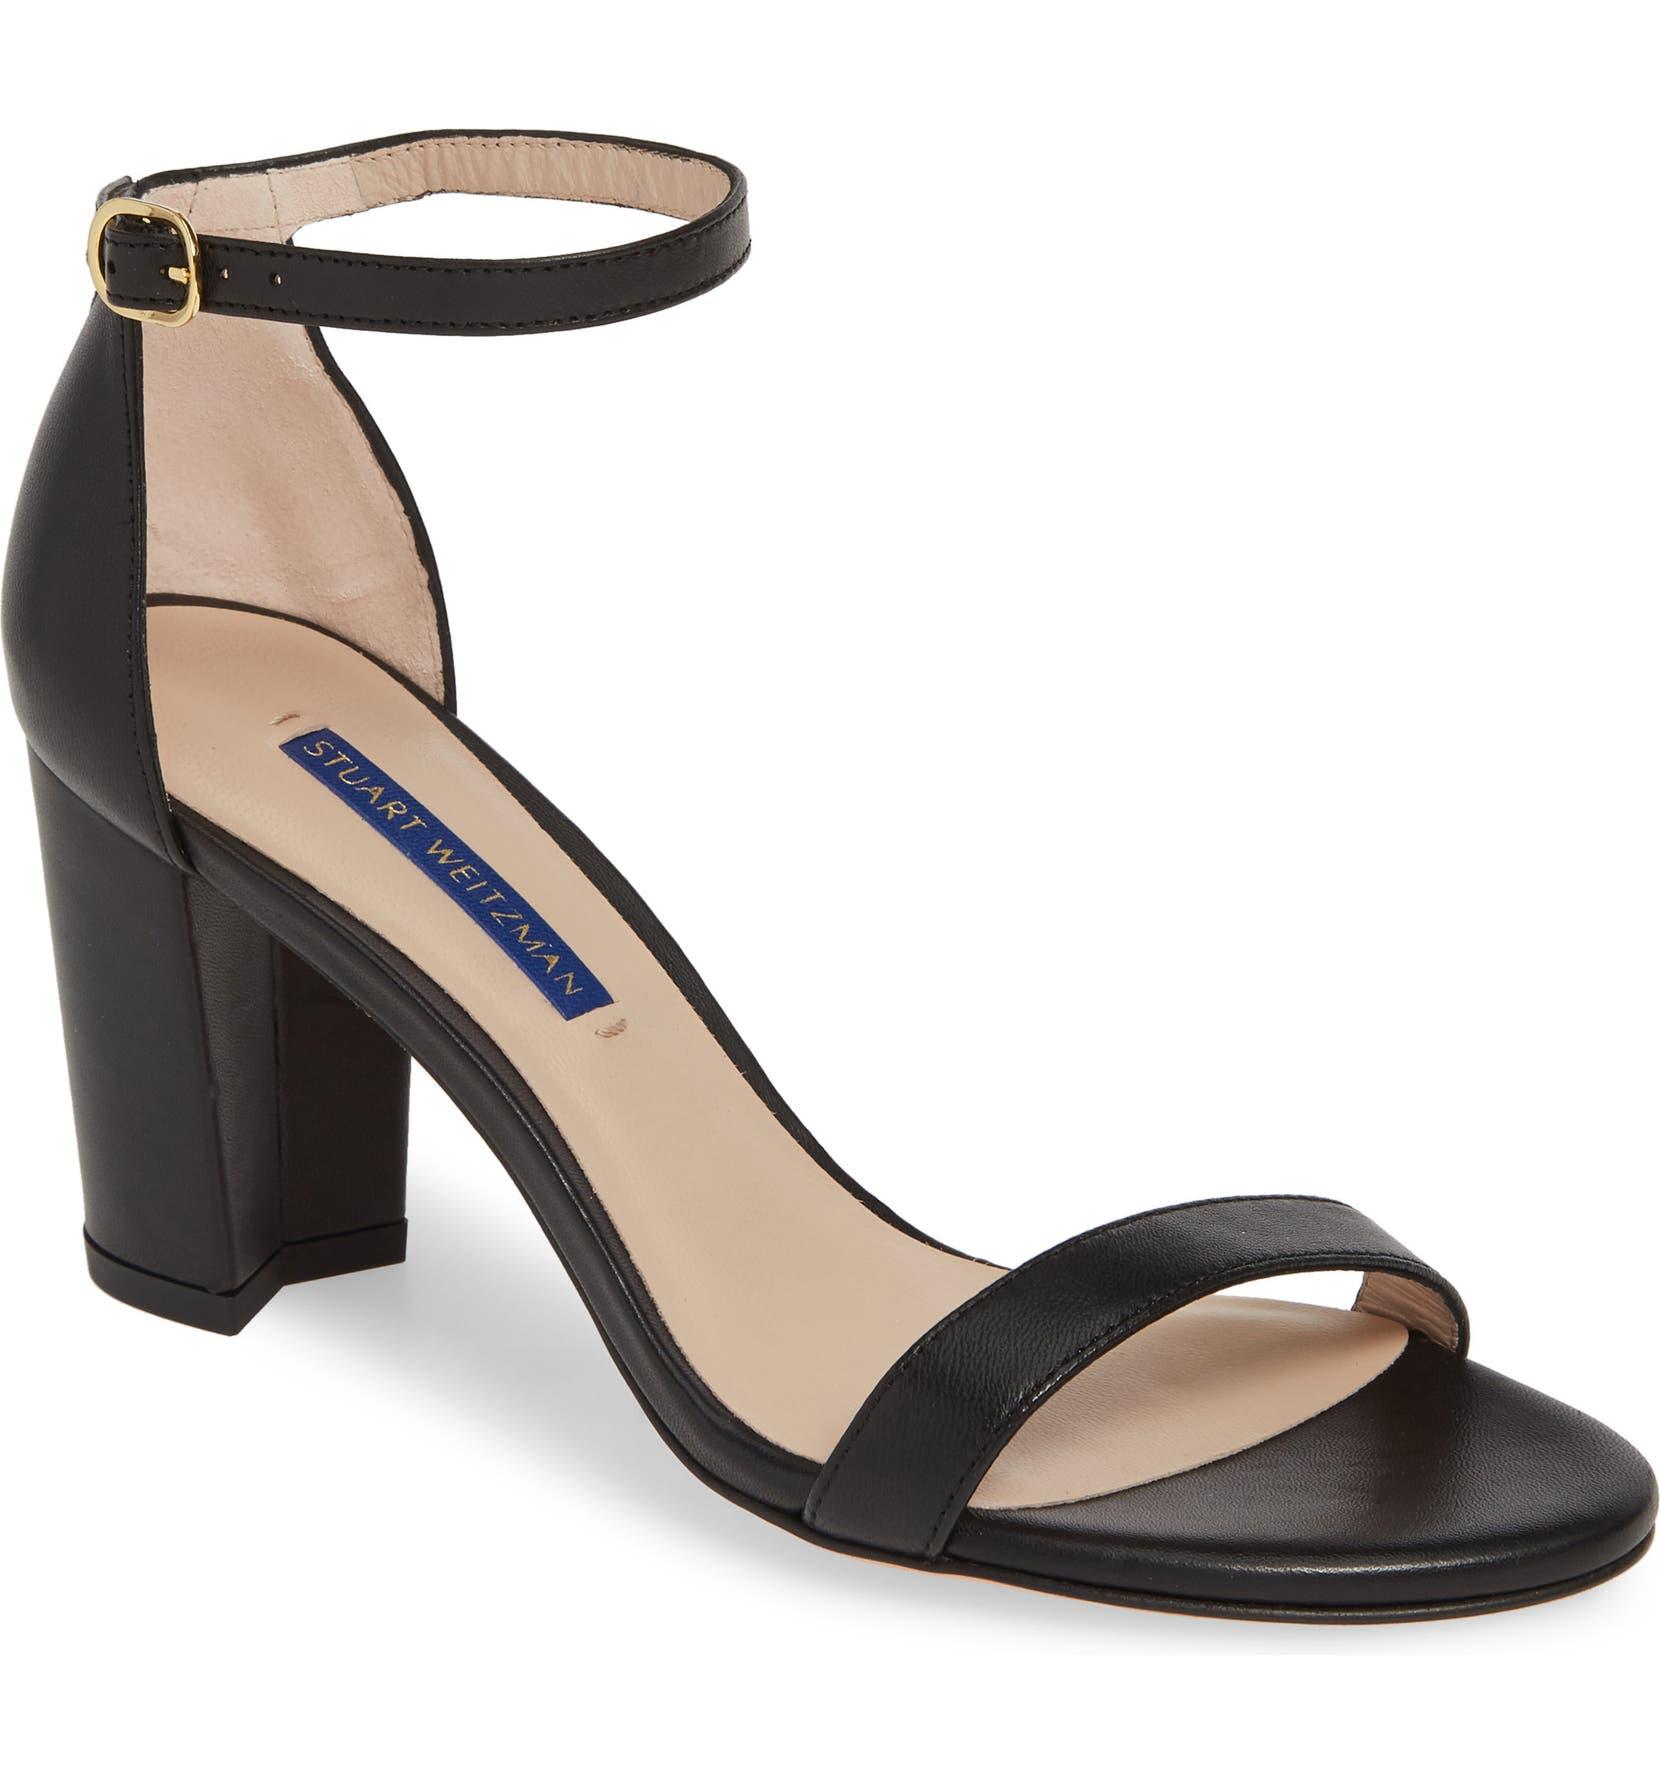 48b1e9a582 Stuart Weitzman NearlyNude Ankle Strap Sandal (Women) | Nordstrom